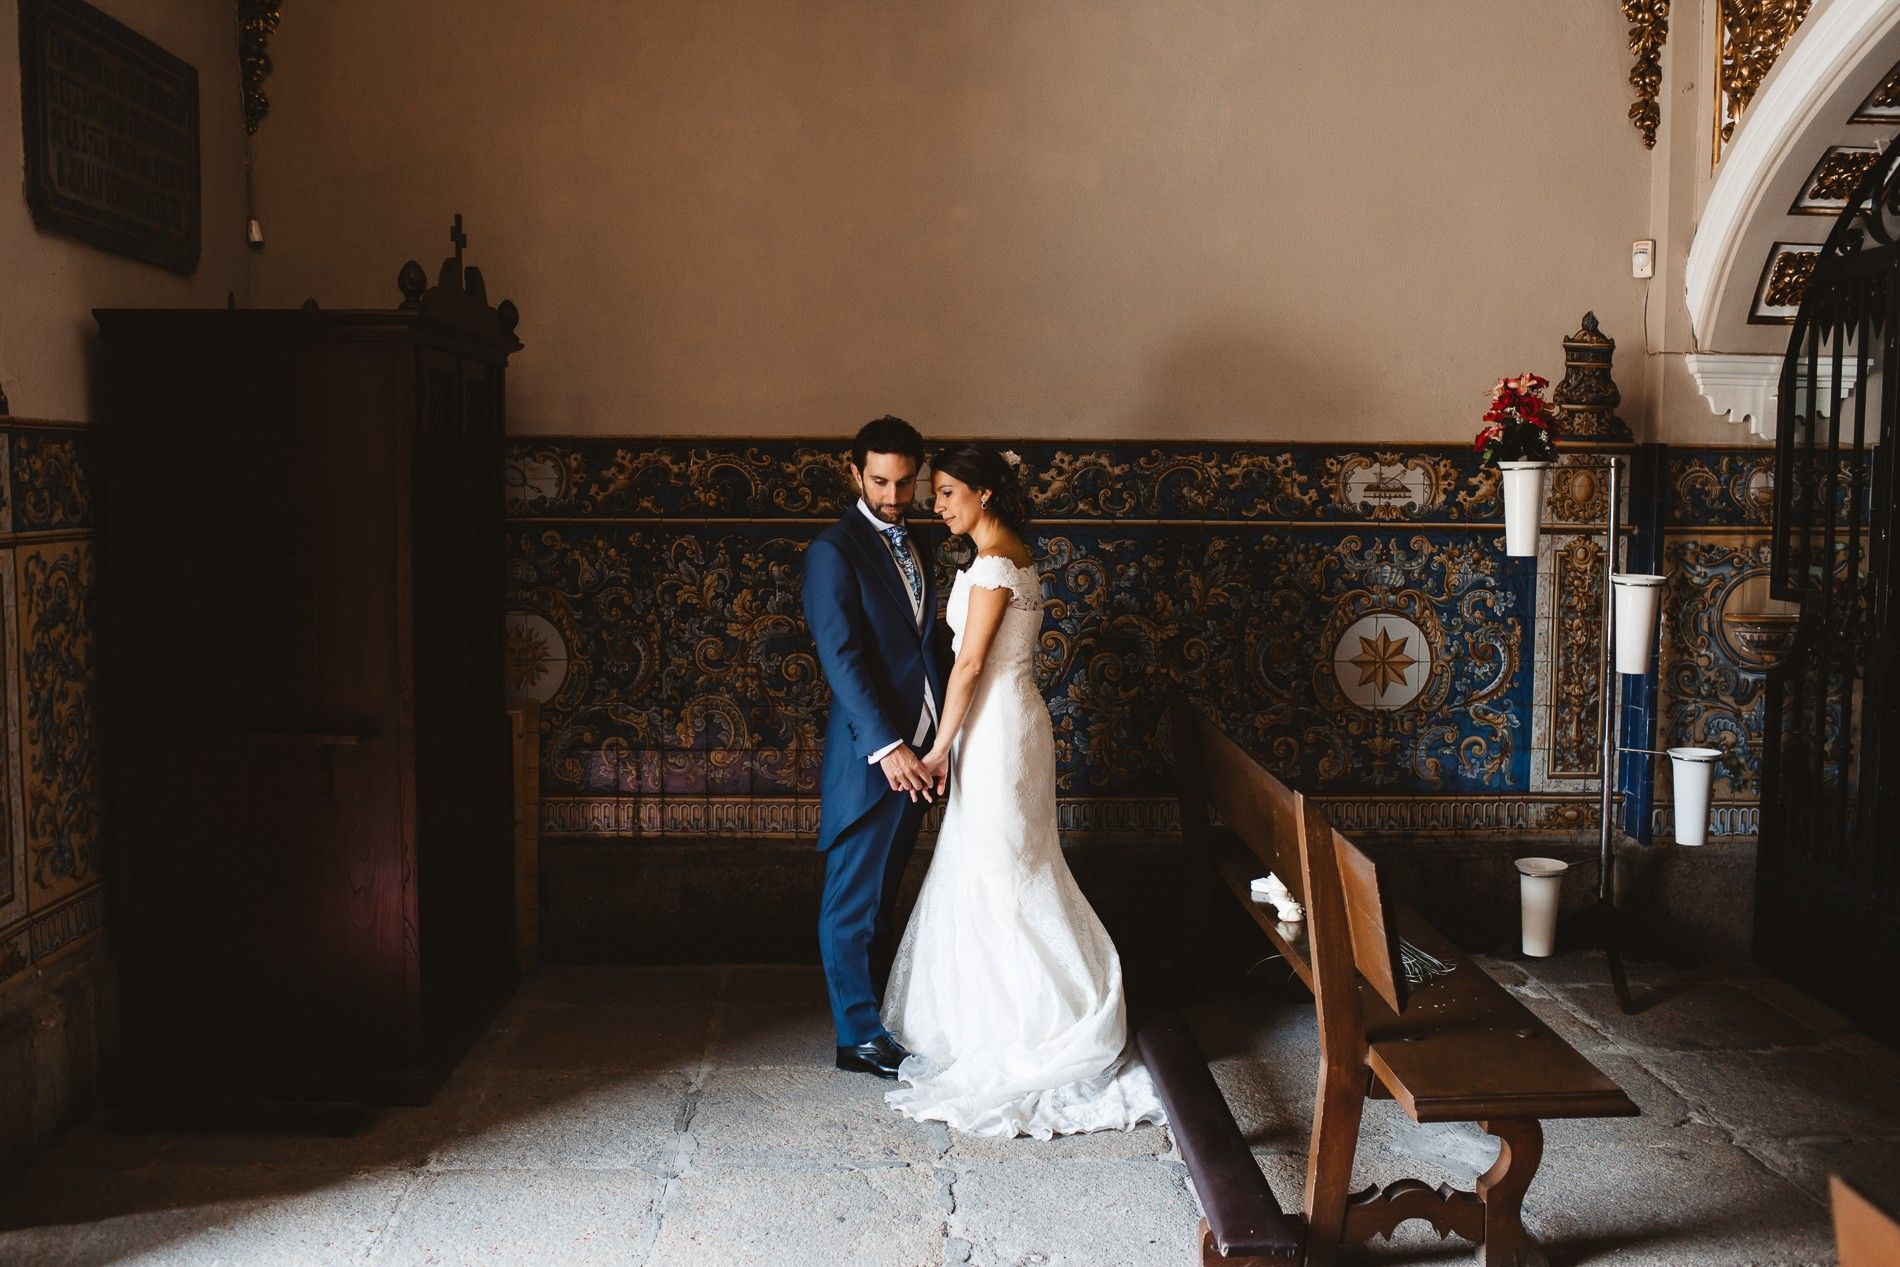 fotografo-de-boda-plasencia-31